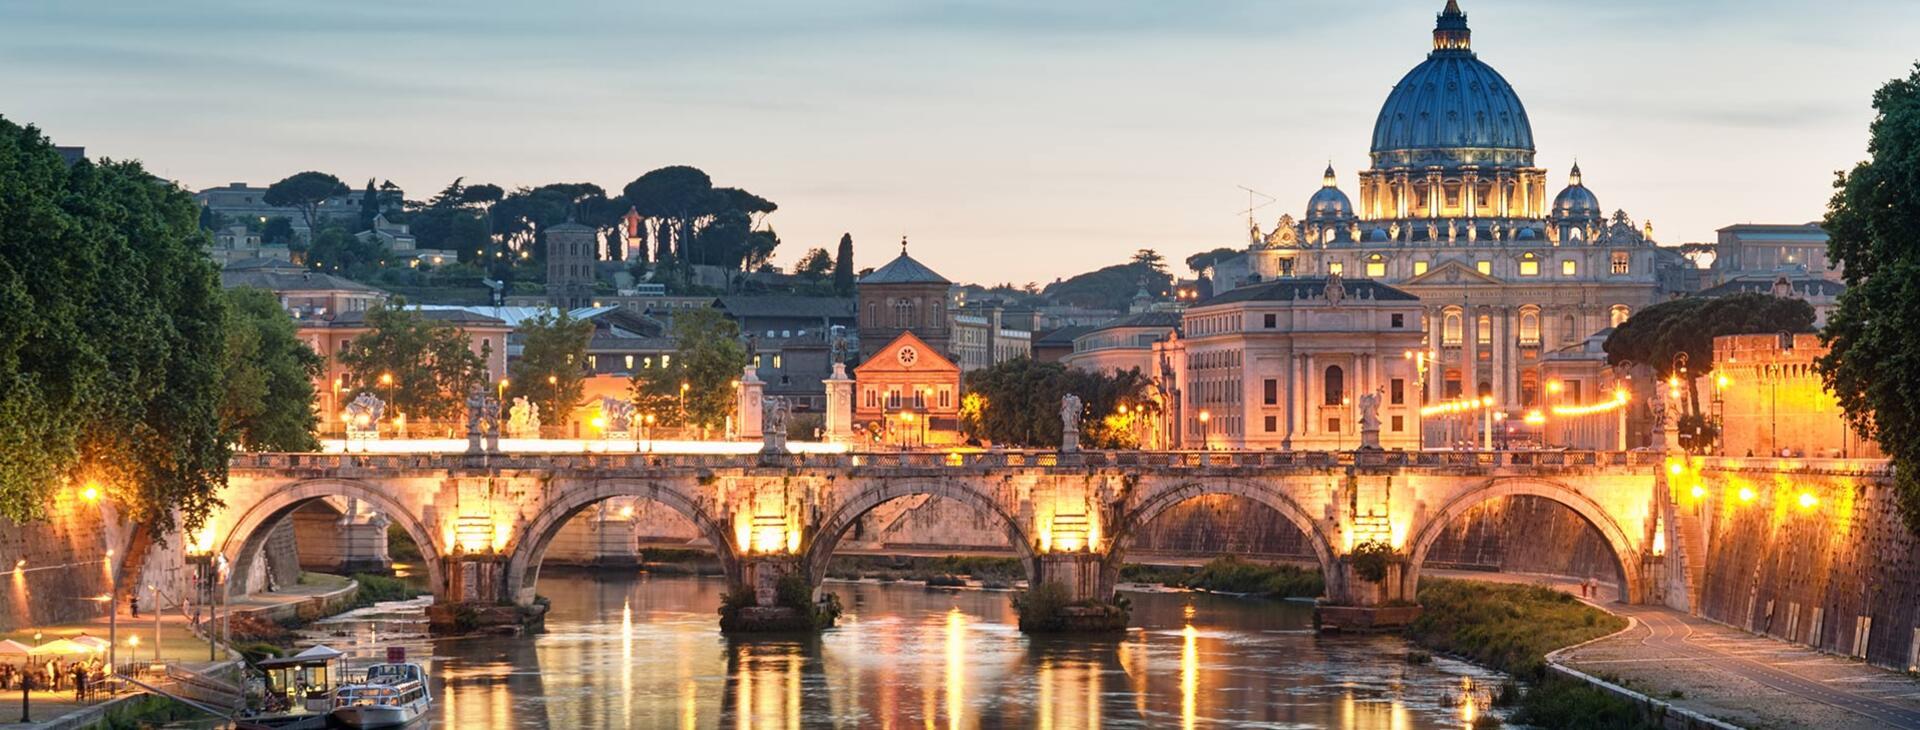 pantheondimoradeglidei it boutique-hotel-pantheon-luoghi-di-interesse-roma 001